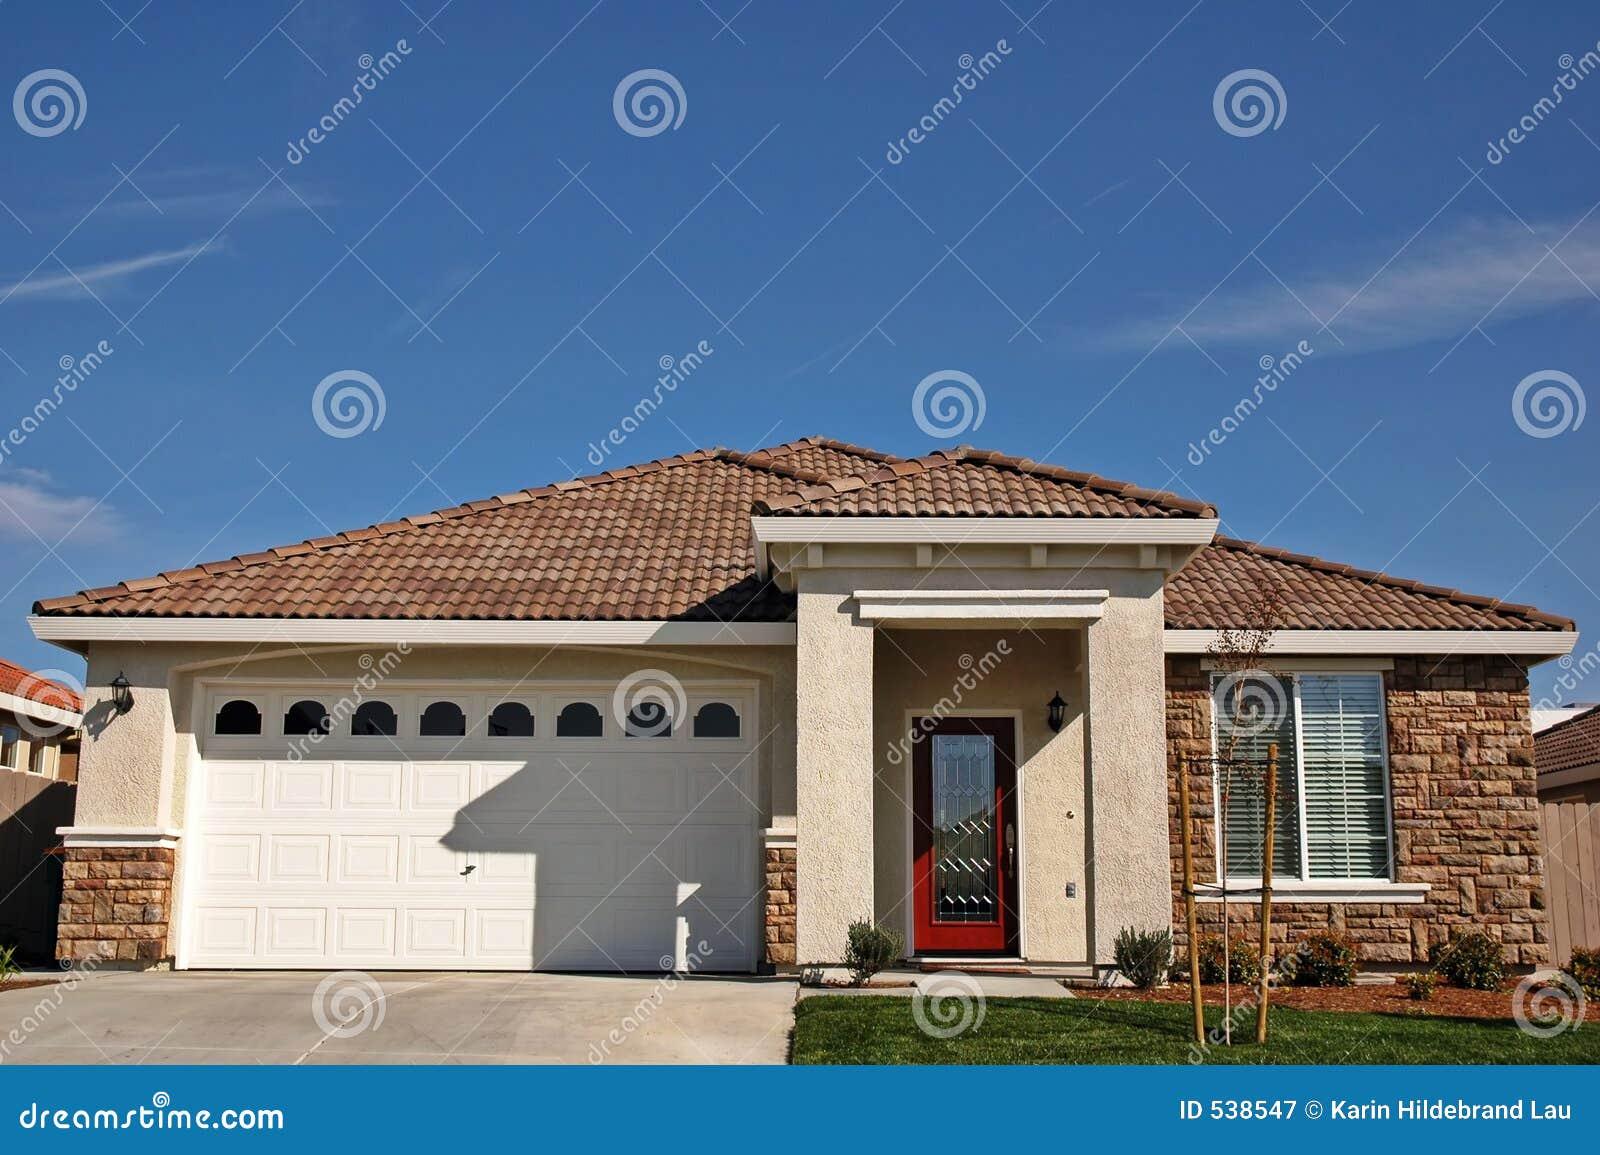 Download 唯一的房子 库存图片. 图片 包括有 属性, 富有, 屋顶, 中止, 梦想, 灰泥, 蓝色, 实际, 前面, 位于 - 538547